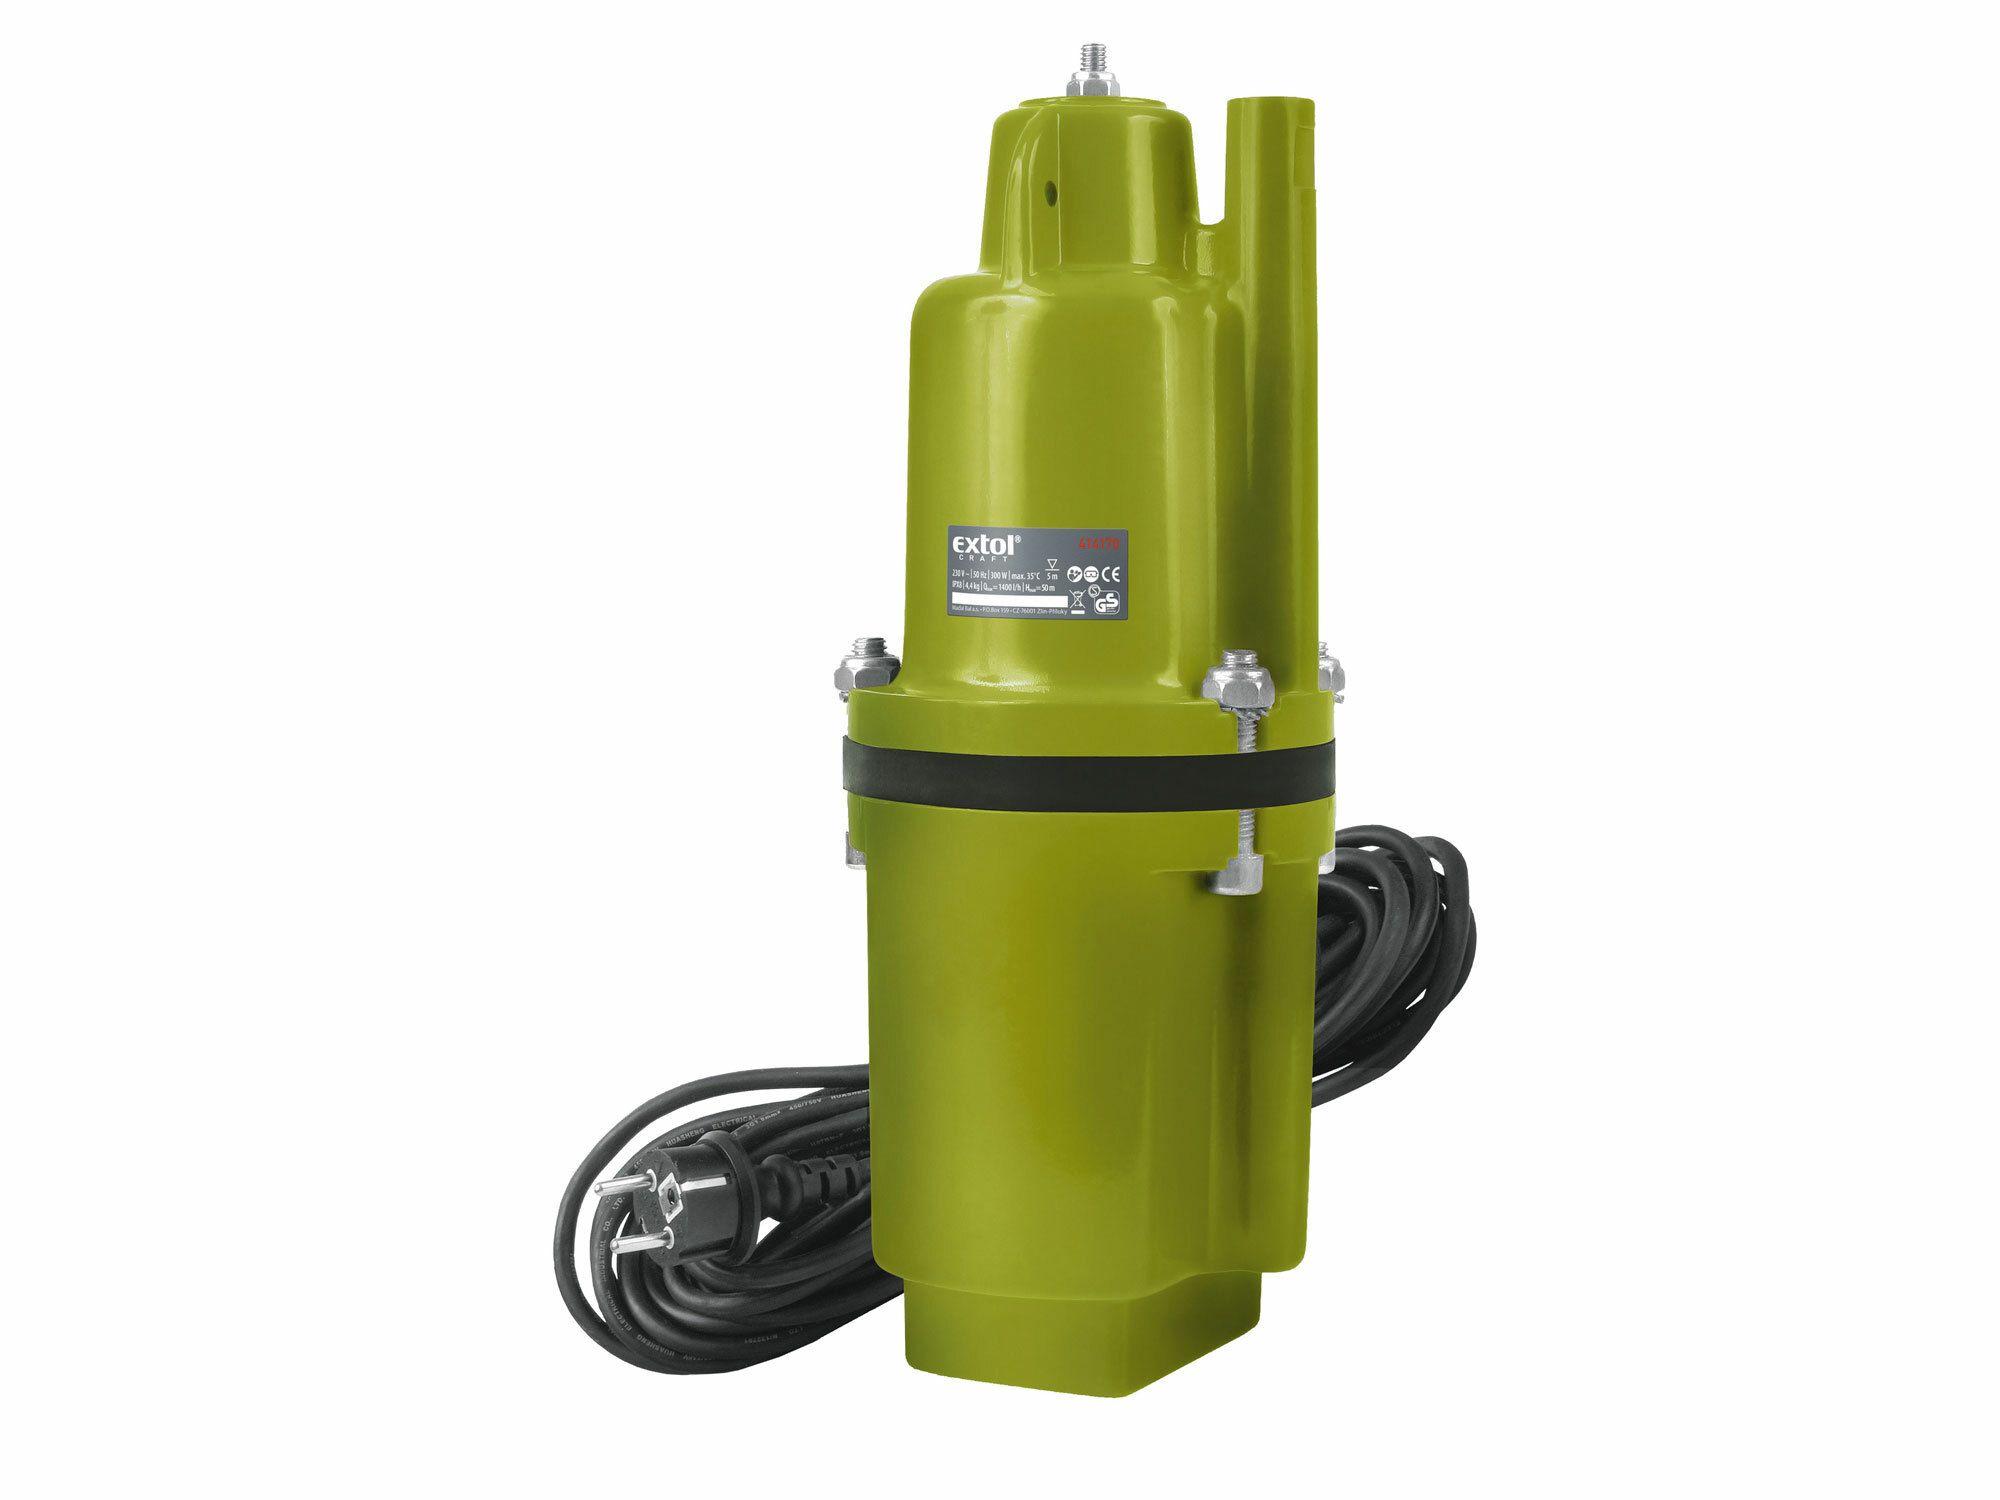 Čerpadlo membránové hlubinné ponorné, 300W, 1400l/hod, 10m EXTOL-CRAFT